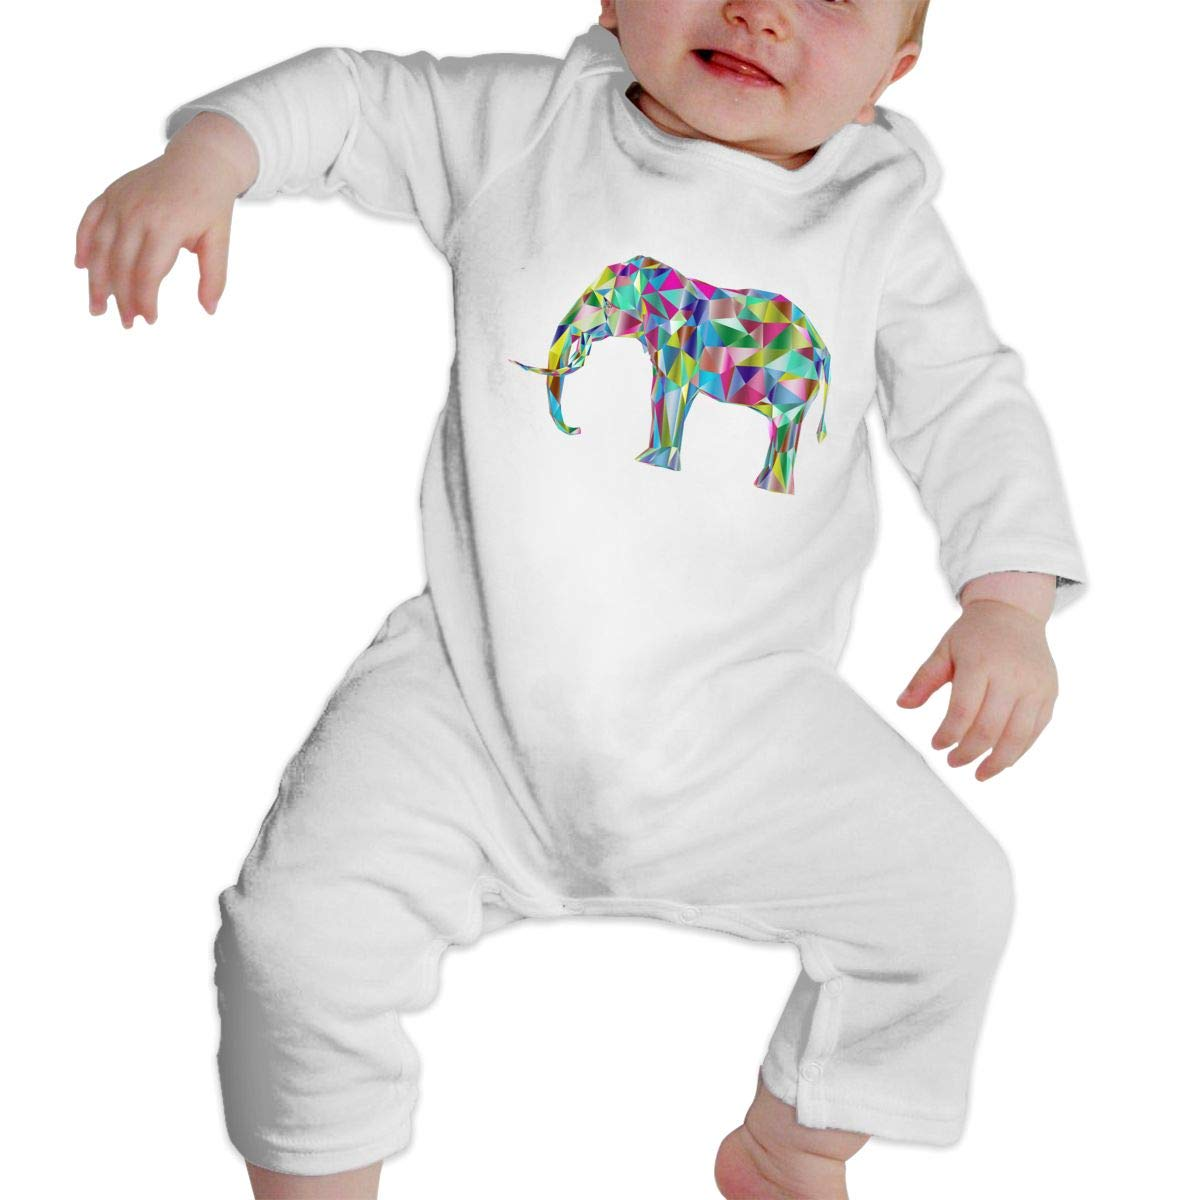 nordic runes Animal Elephant Baby Onesies Toddler Baby Girl//Boy Unisex Clothes Romper Jumpsuit Bodysuit One Piece